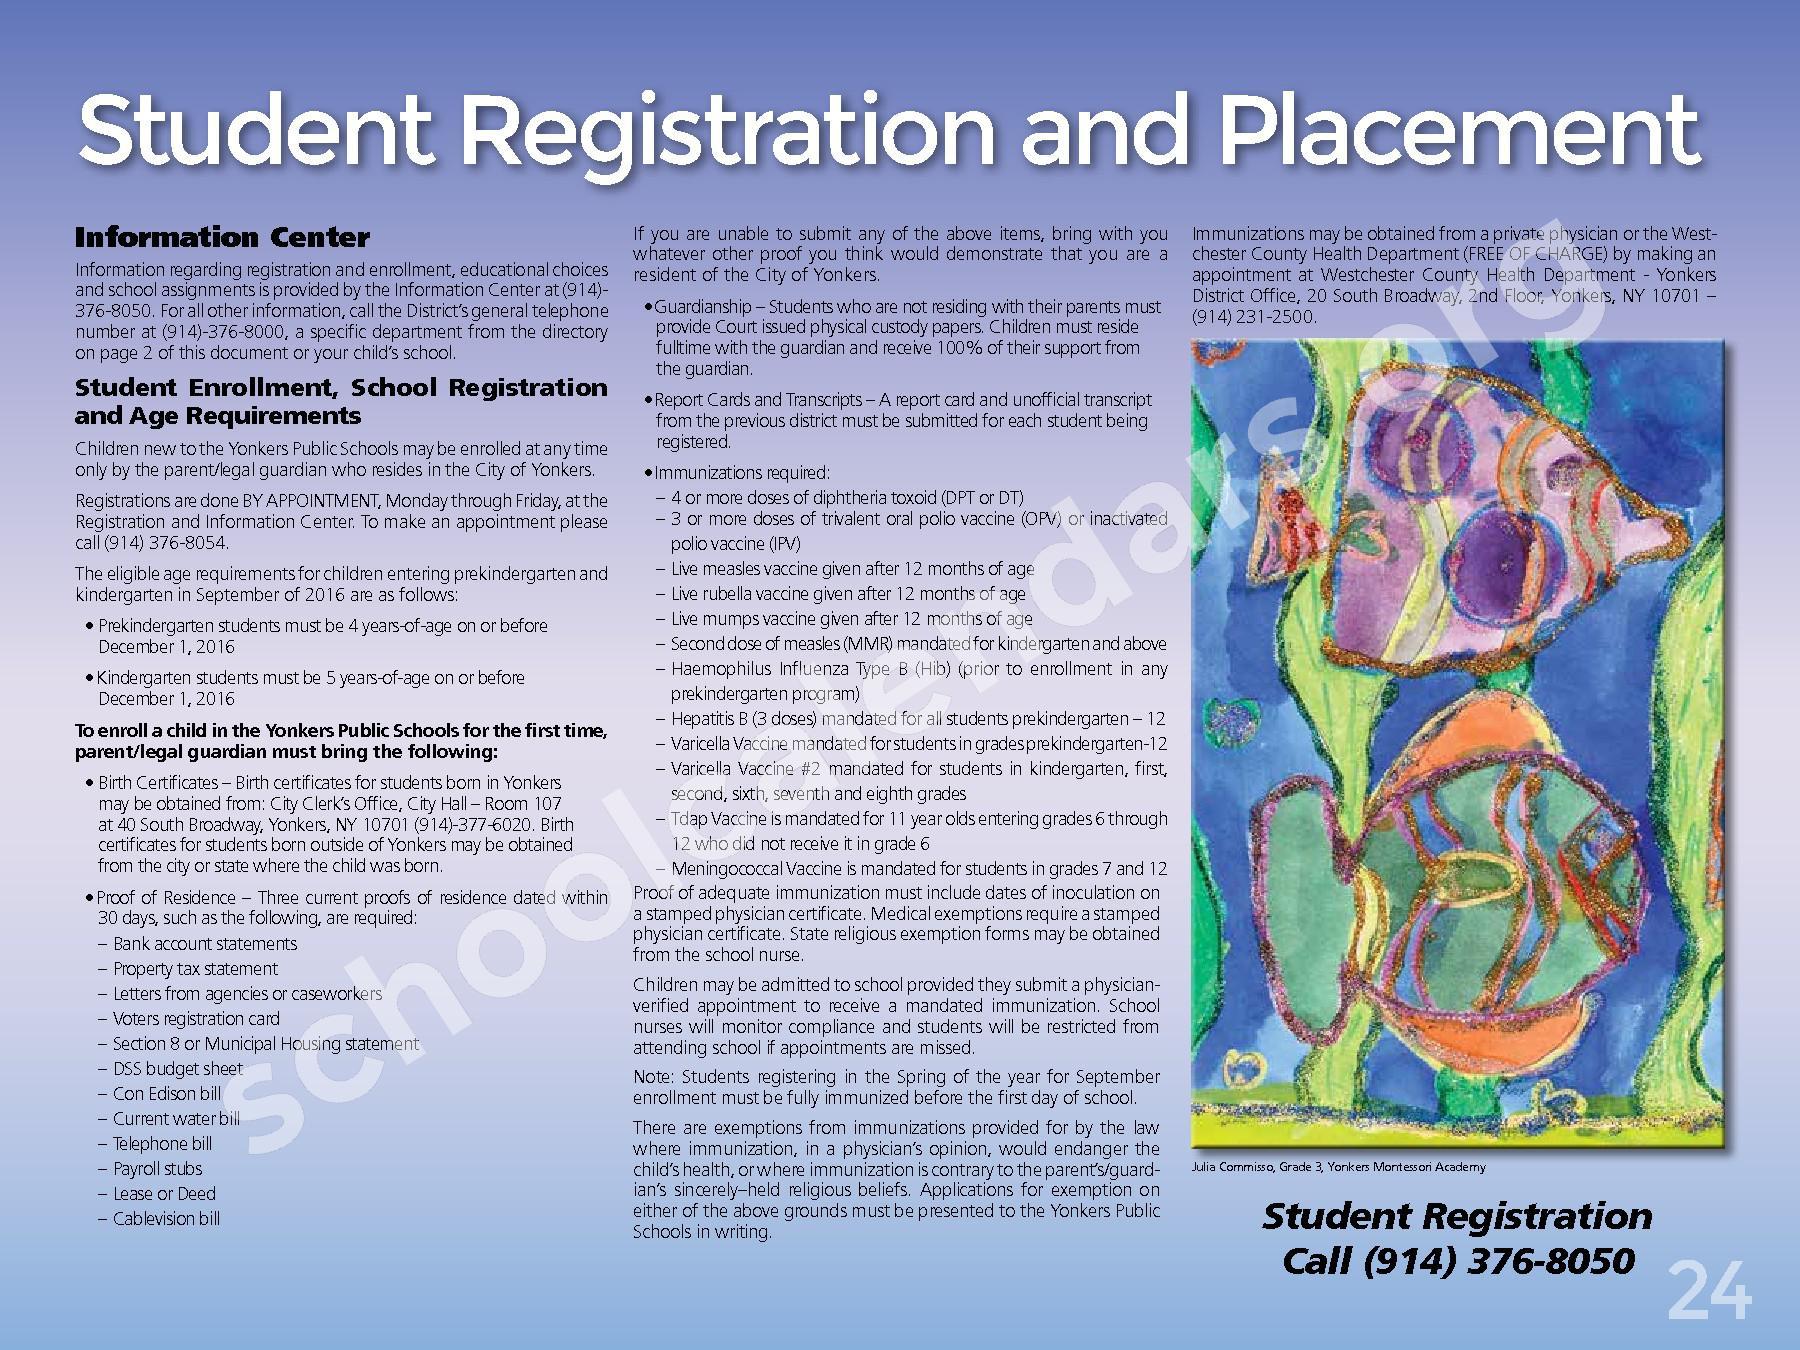 2017 - 2018 District Calendar – Yonkers City School District – page 26